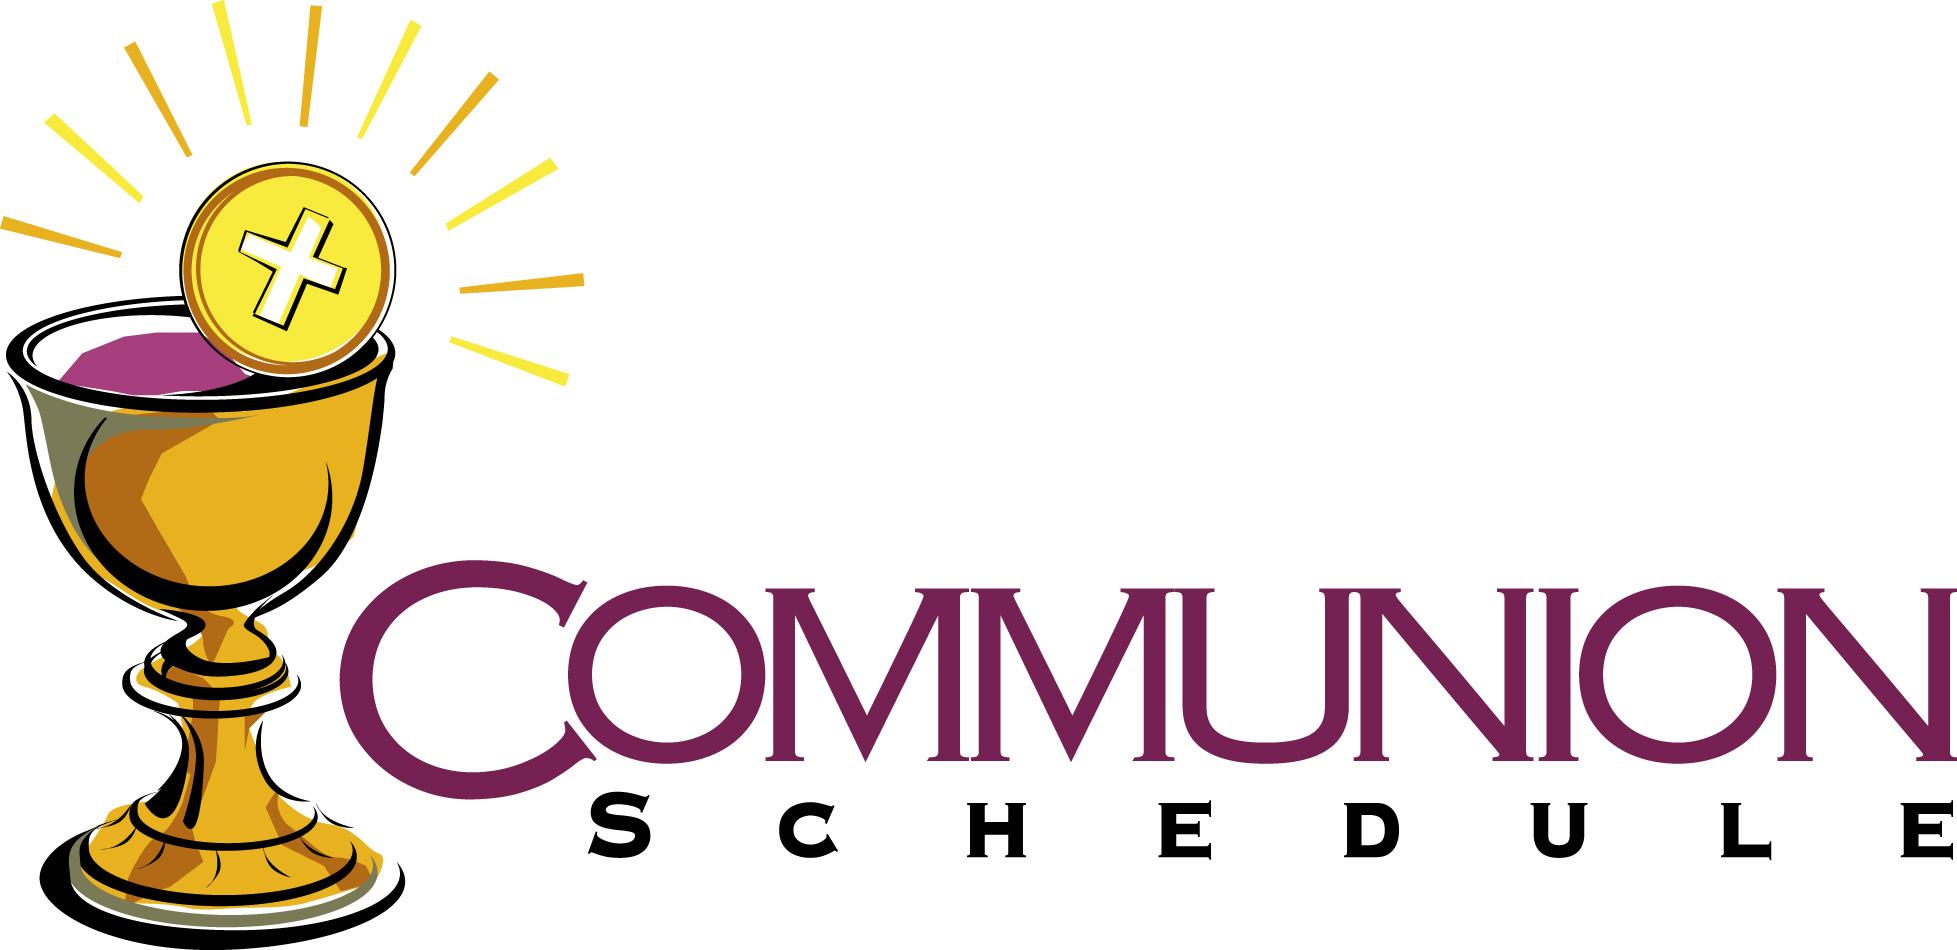 First Communion Clip Art #3304-First Communion Clip Art #3304-14